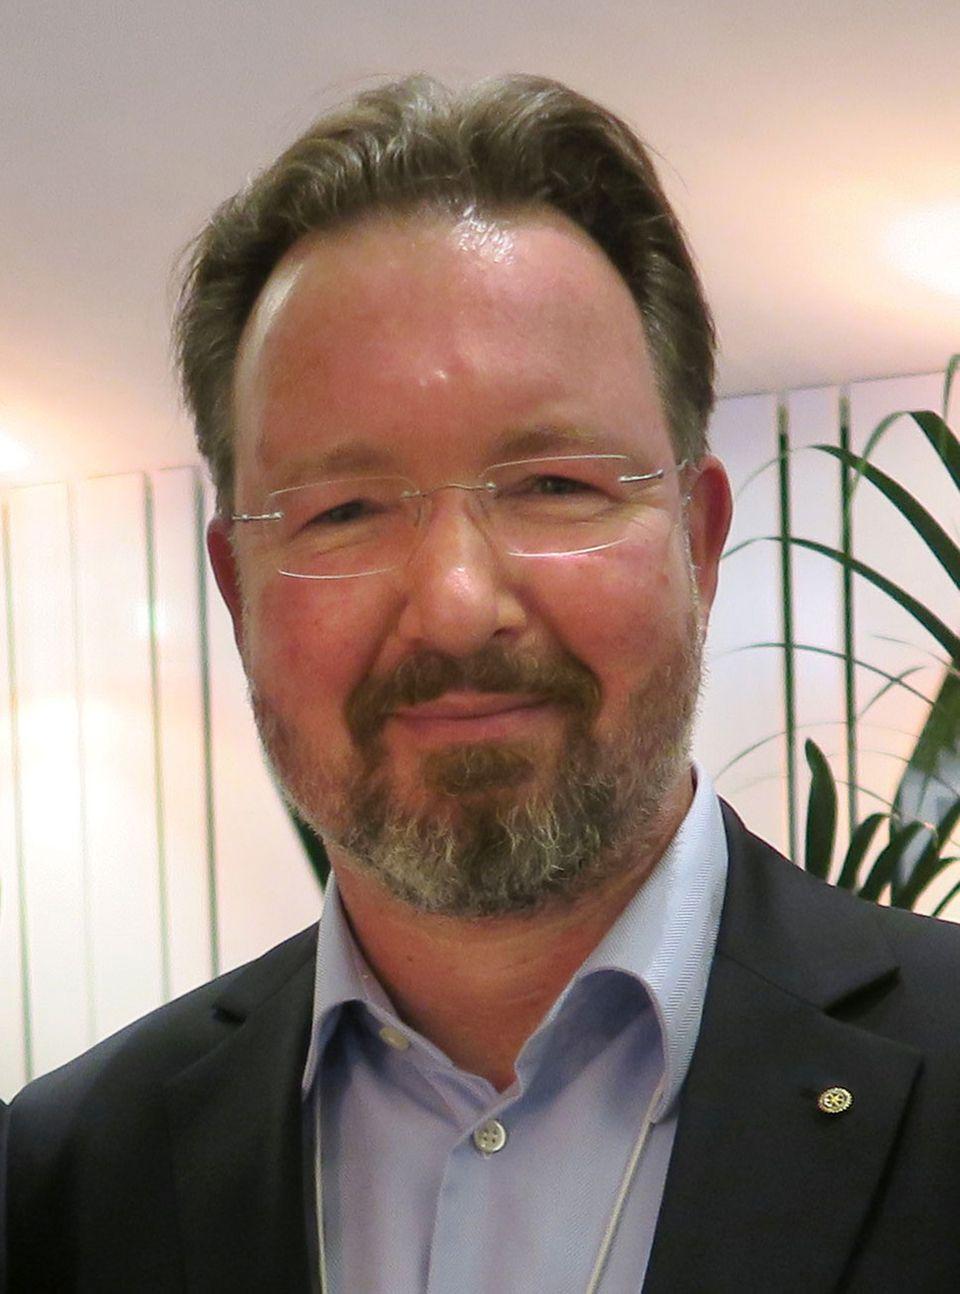 Nordkorea-Experte Rüdiger Frank